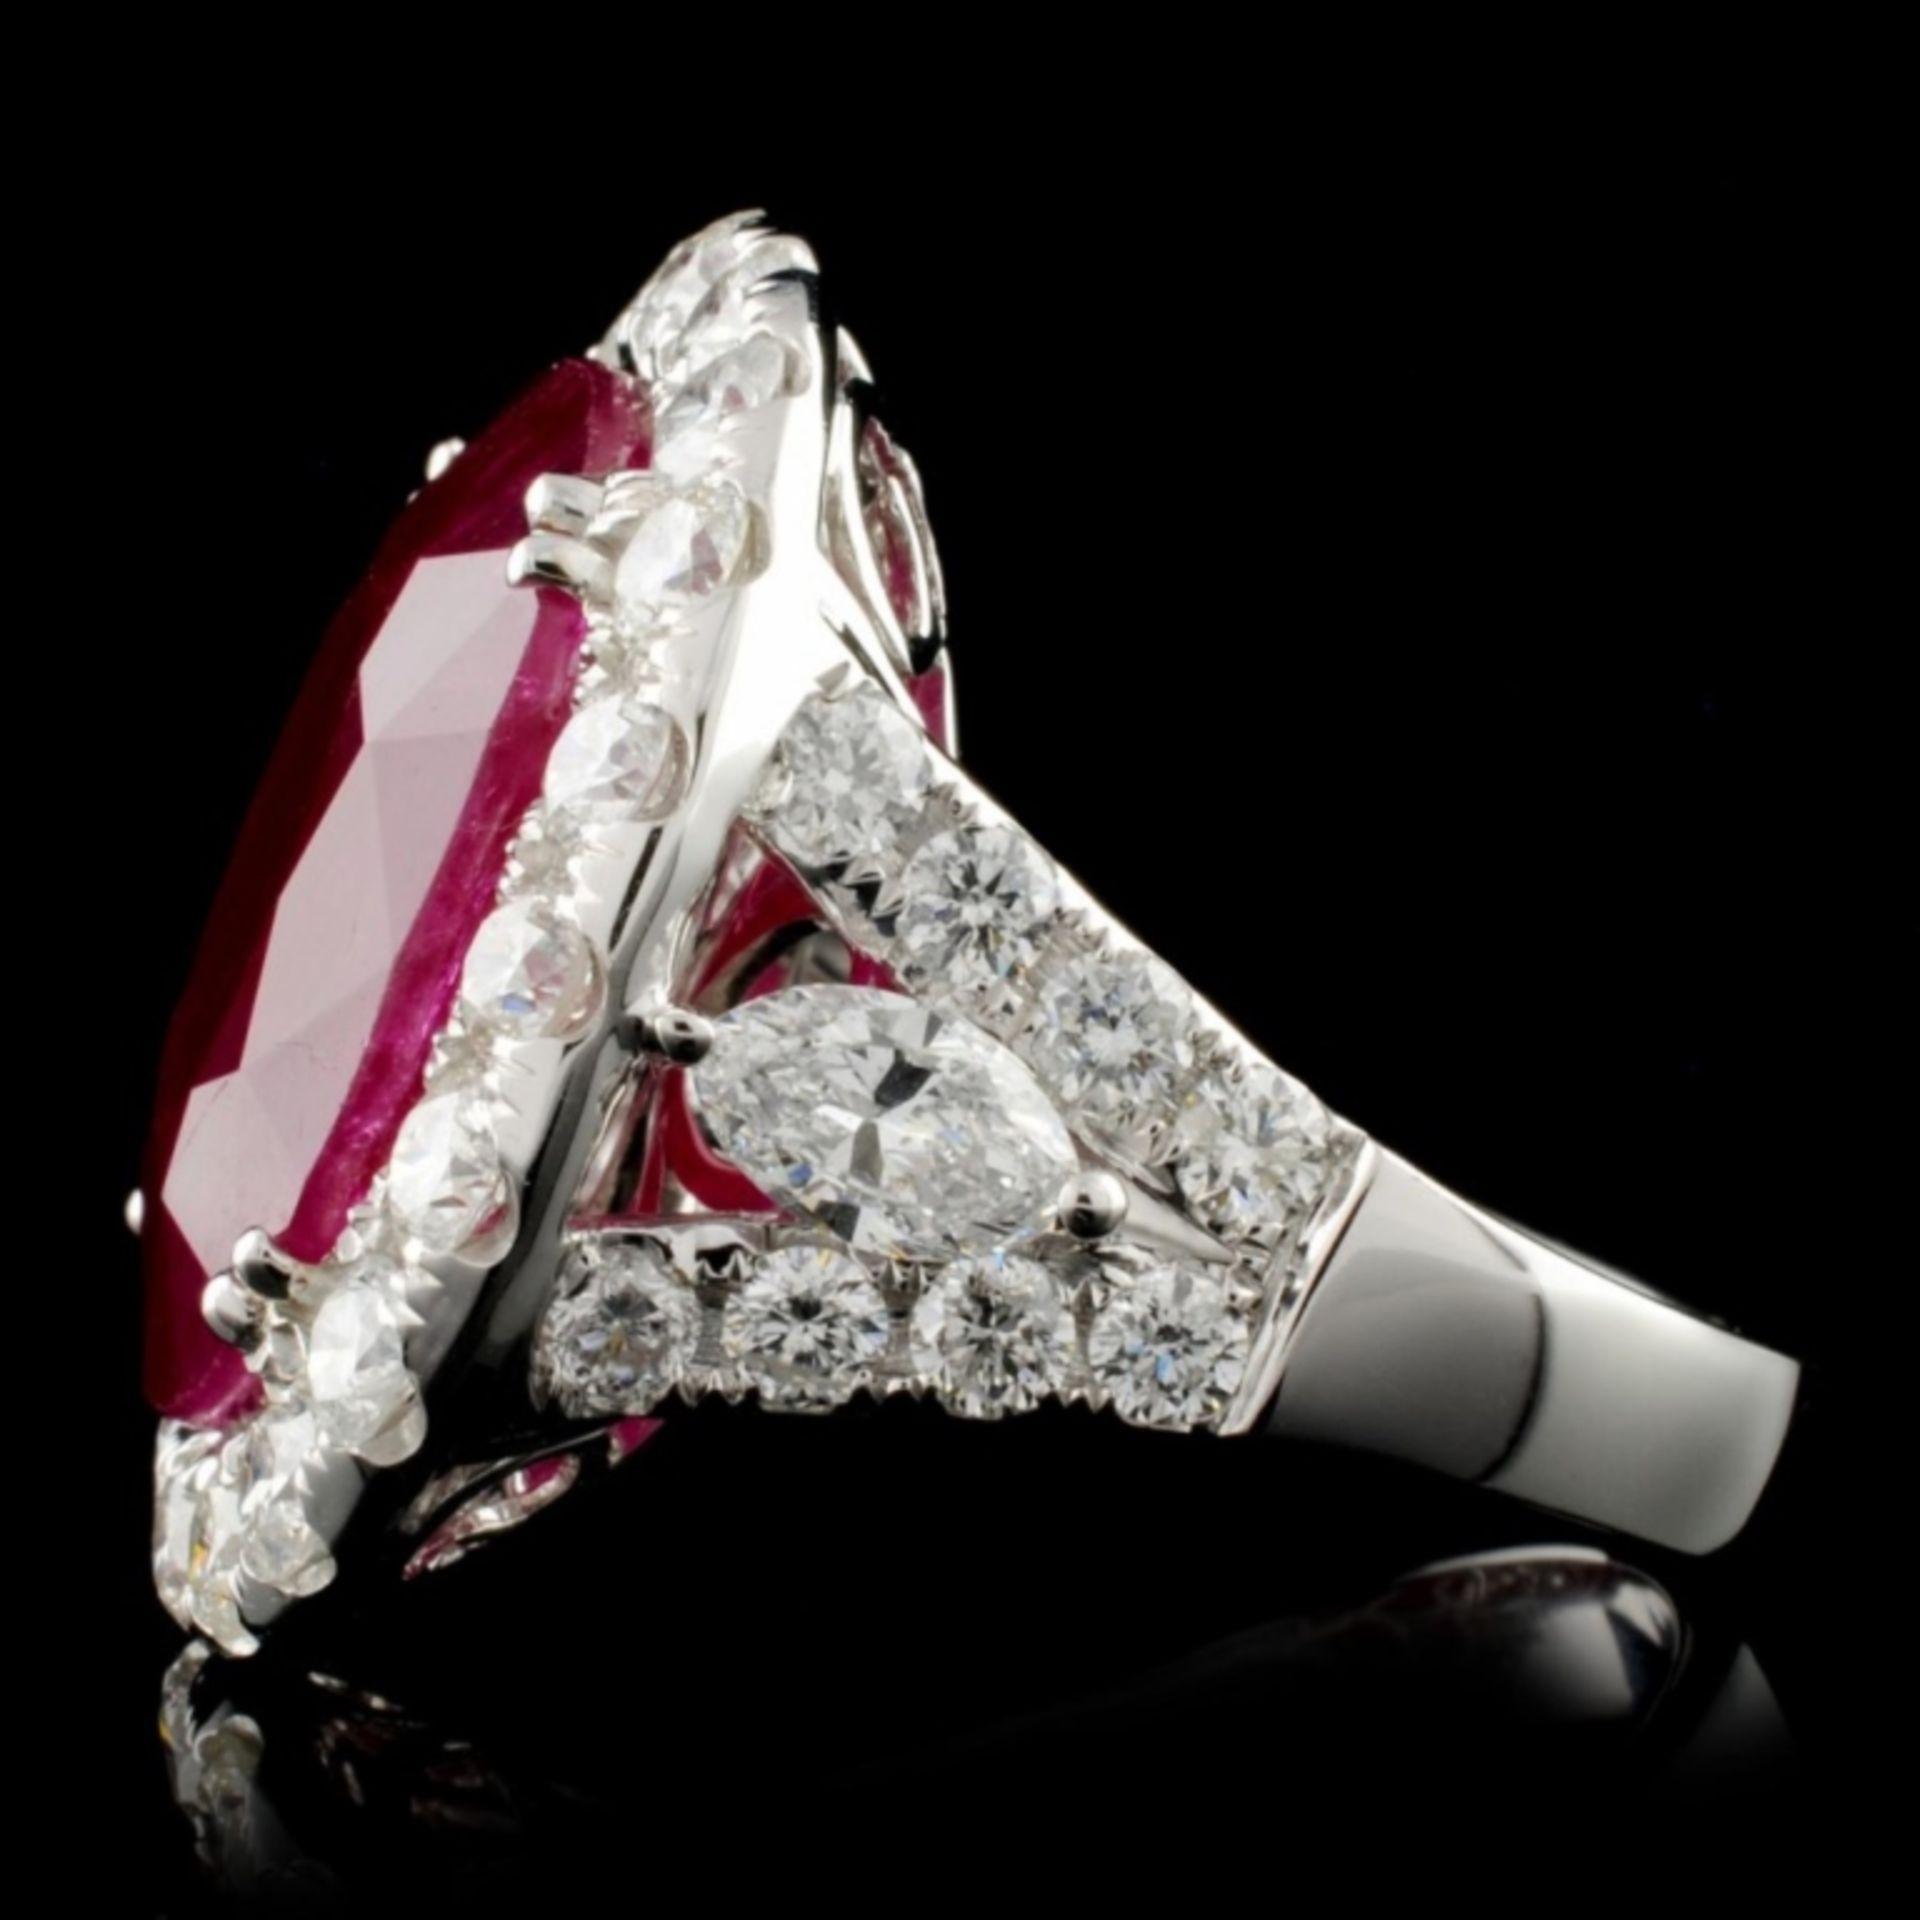 18K White Gold 15.55ct Ruby & 3.34ct Diamond Ring - Image 3 of 4